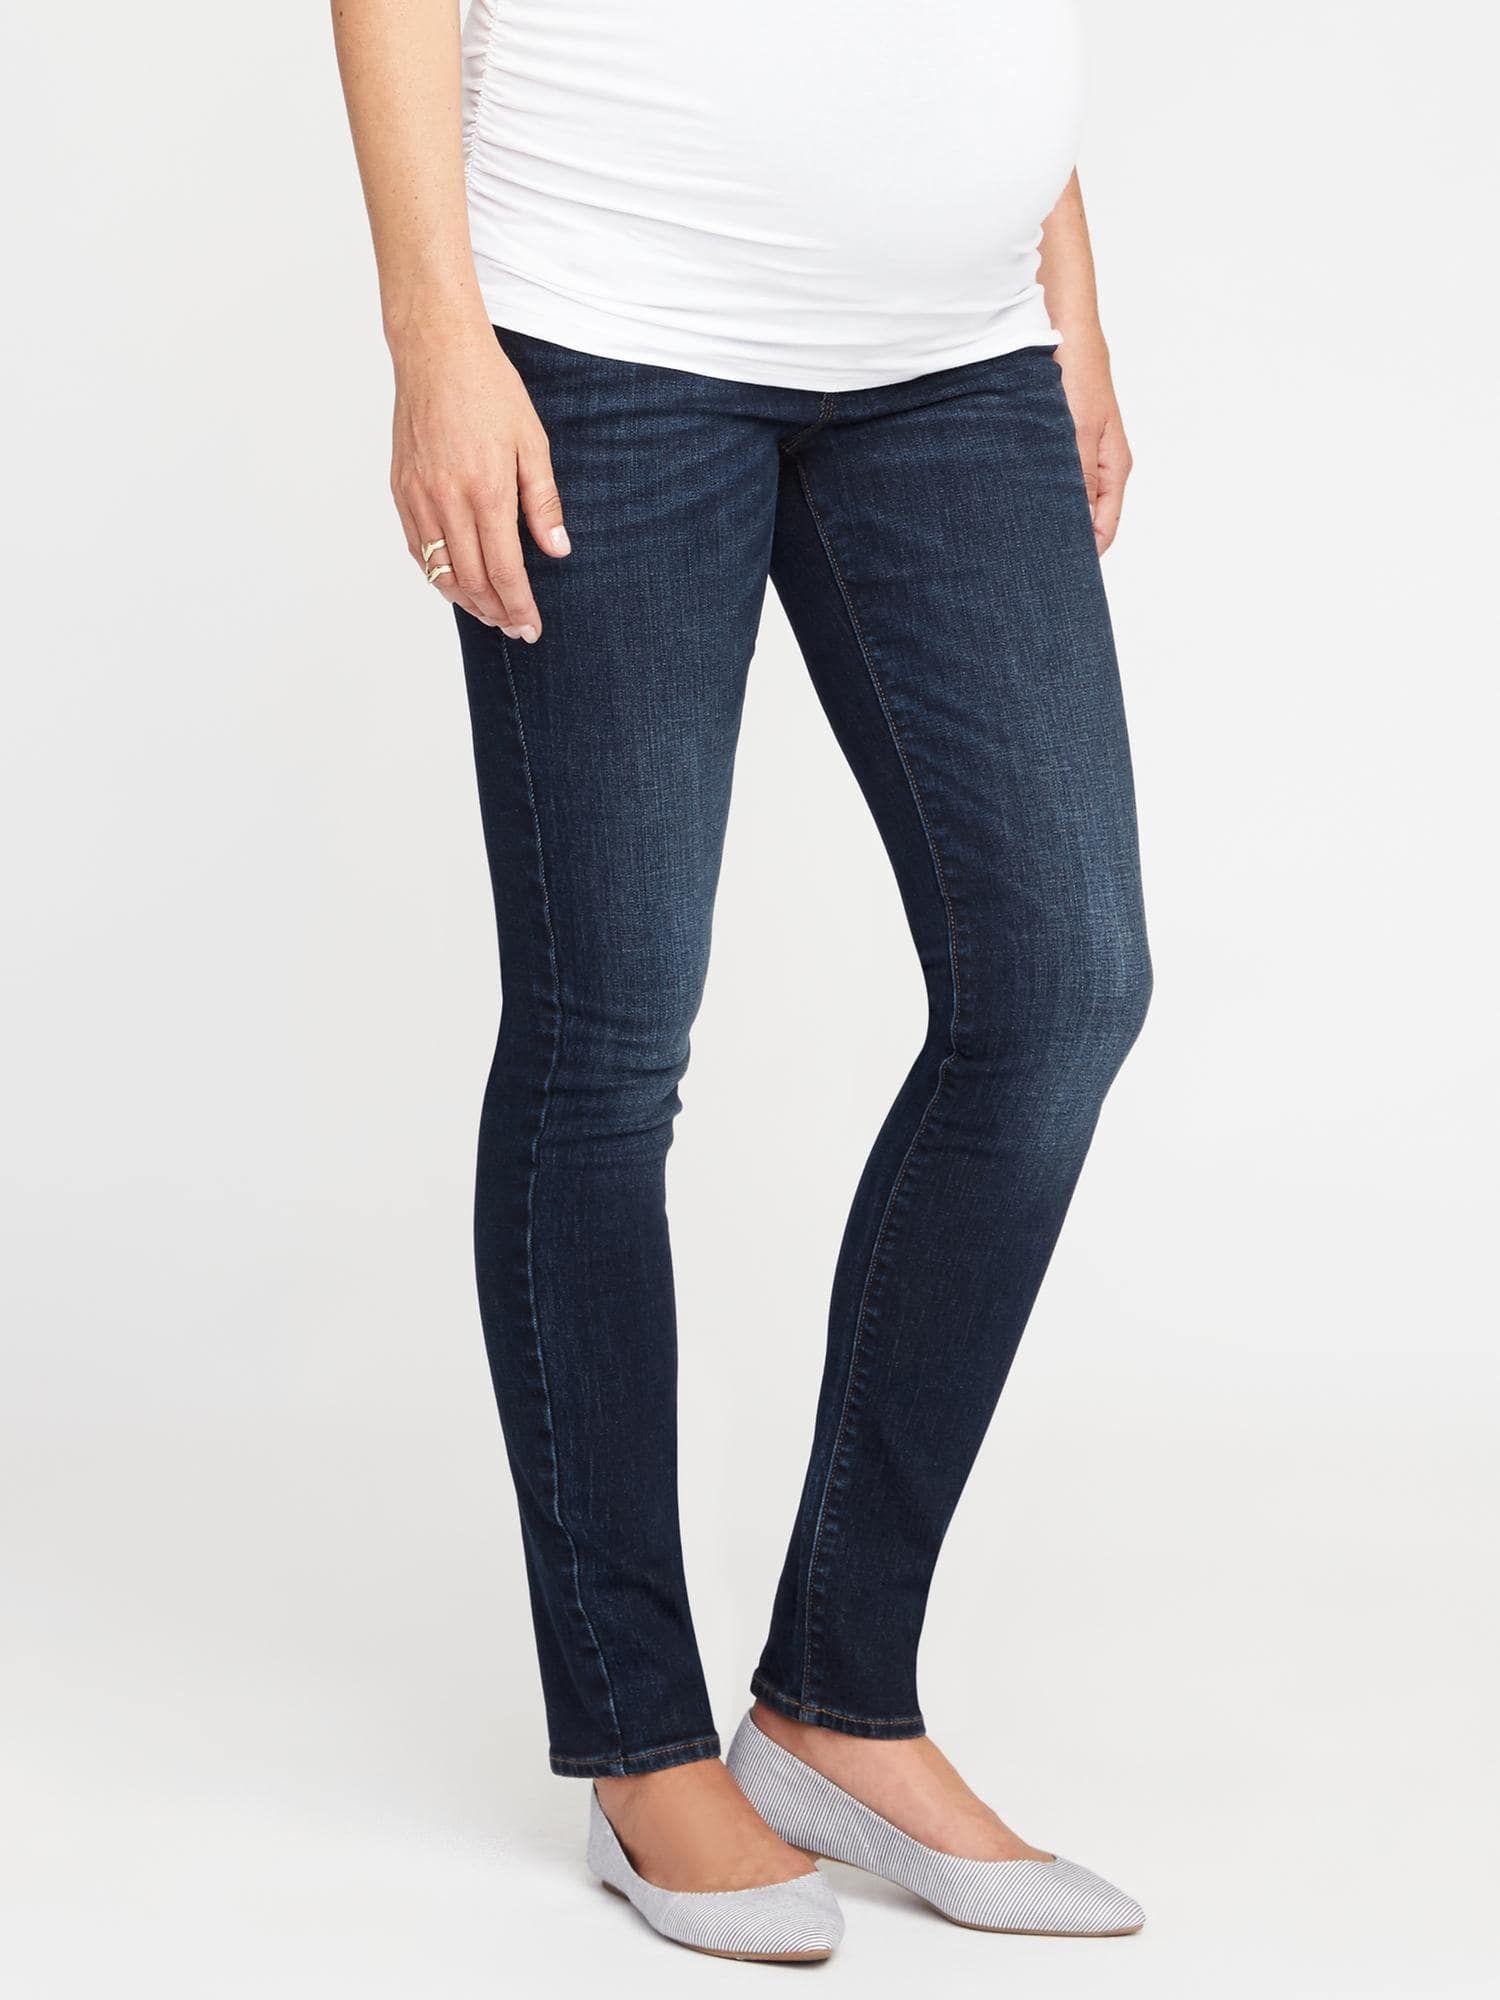 d7bb37c1dc5 Maternity Full-Panel Skinny Jeans   Pregos/Nursing-breastfeeding ...